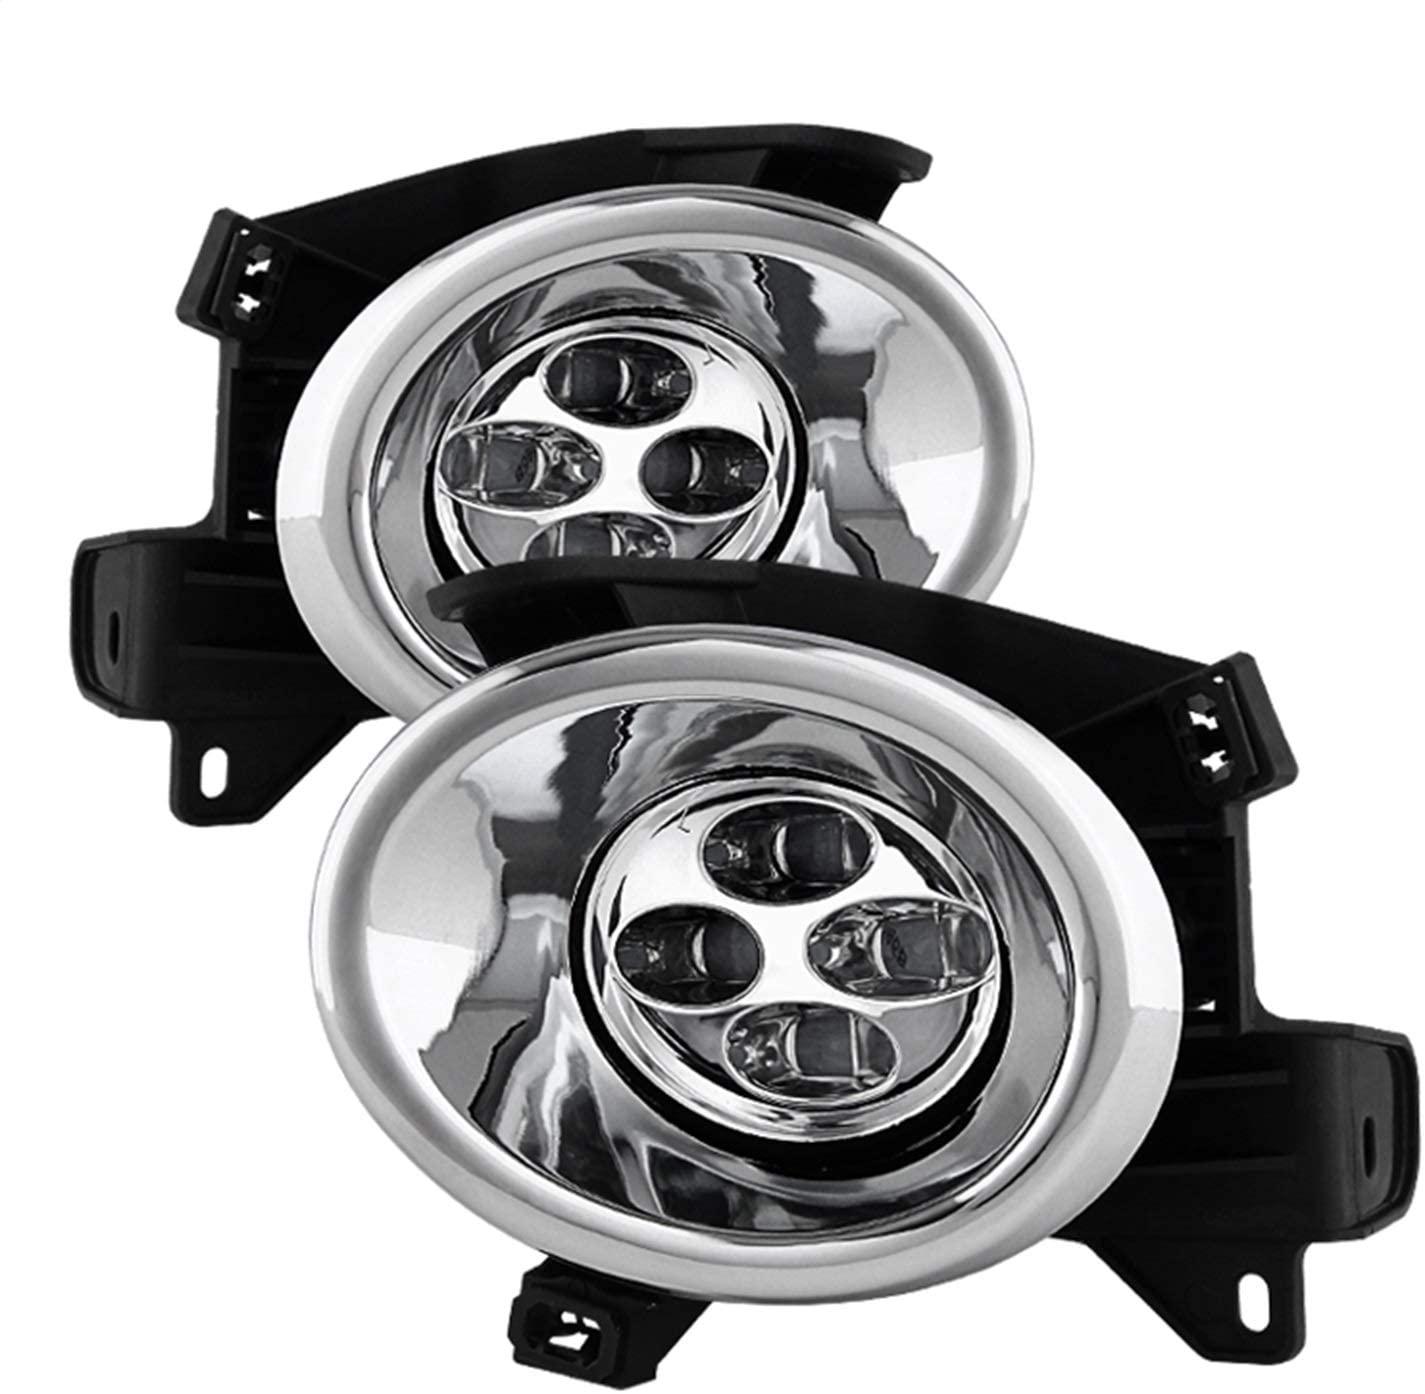 Spyder Auto FL-DRL-NP2013-C Nissan Pathfinder LED Fog Light